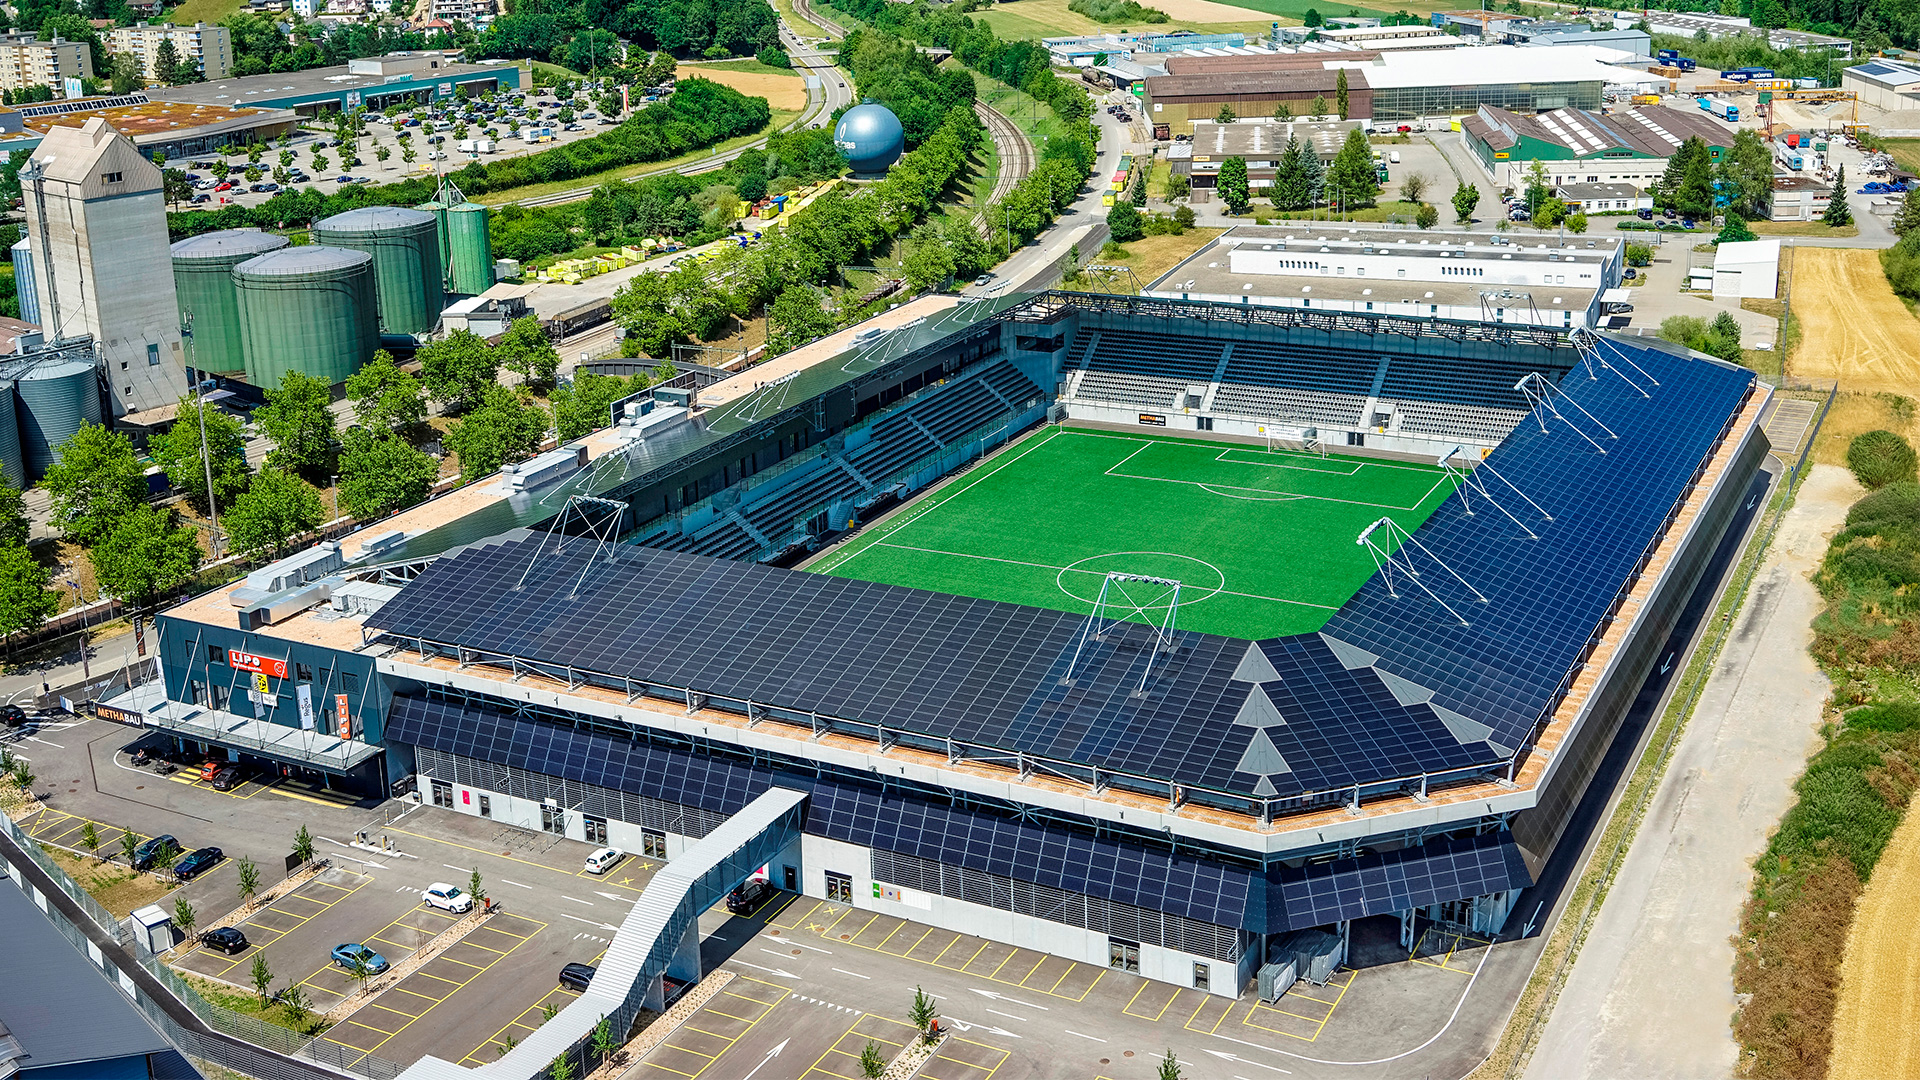 Größtes Fußballstadion Europas